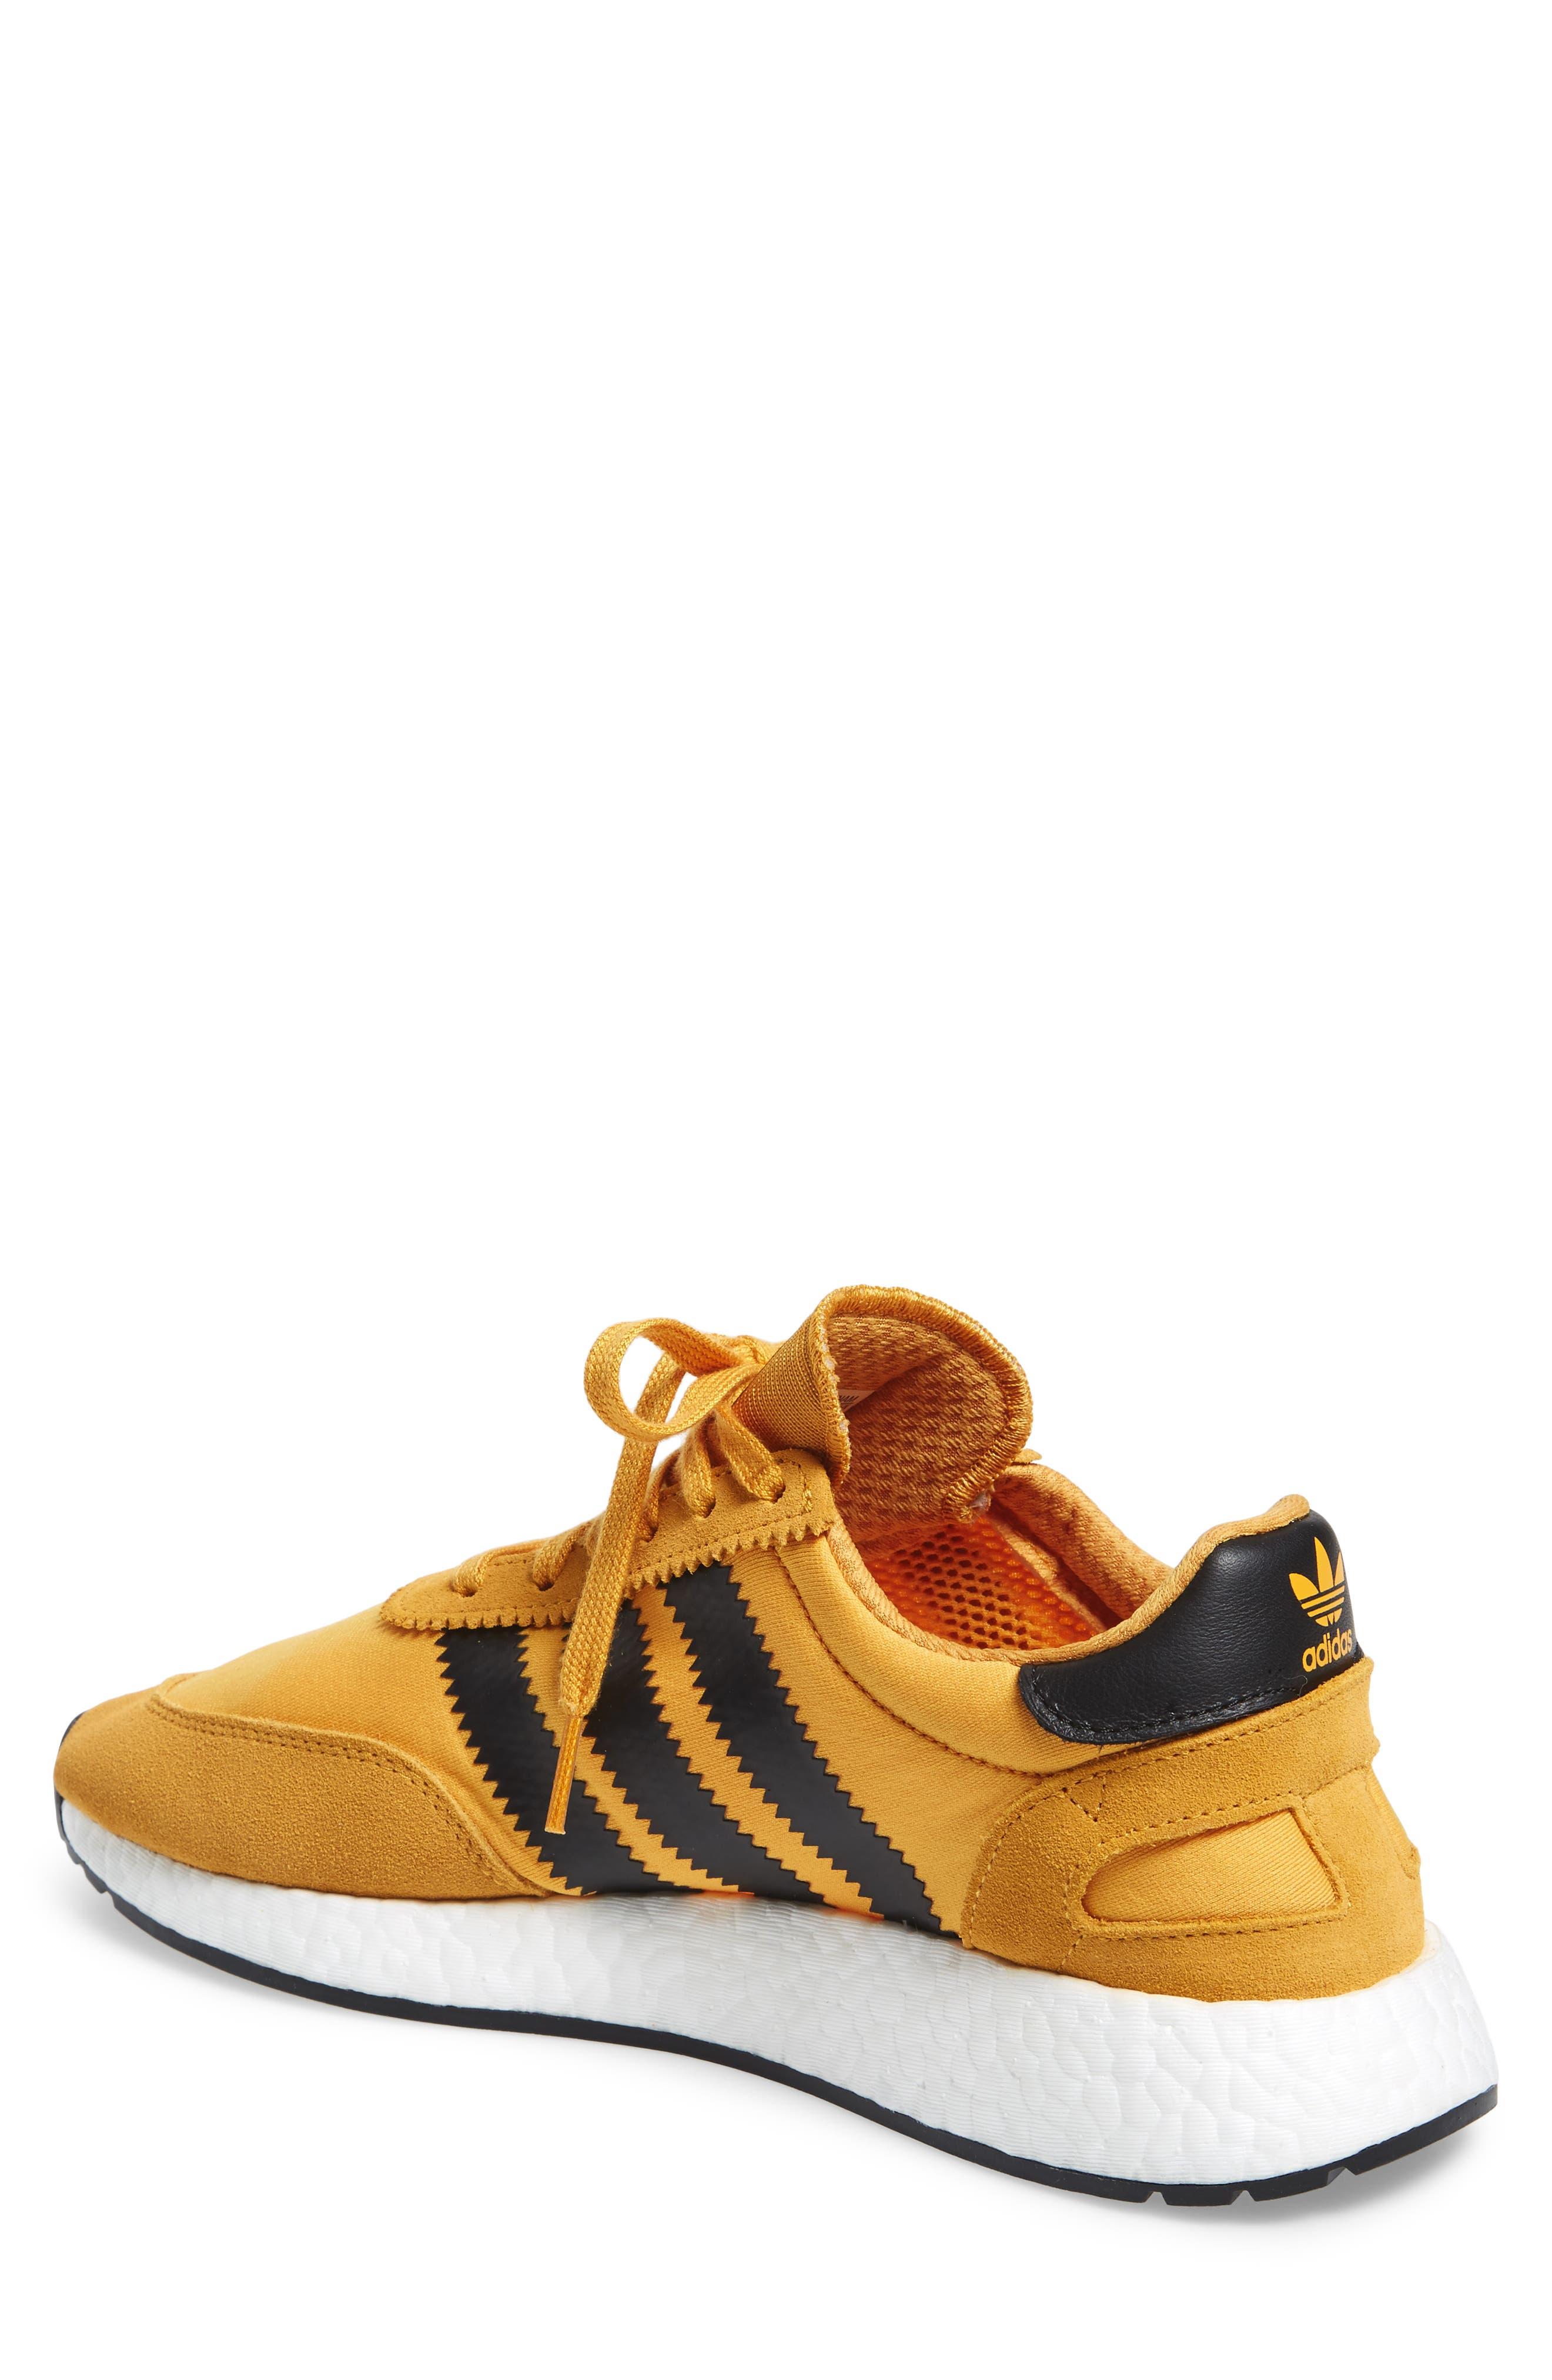 I-5923 Sneaker,                             Alternate thumbnail 2, color,                             Tactile Yellow/ Black/ White